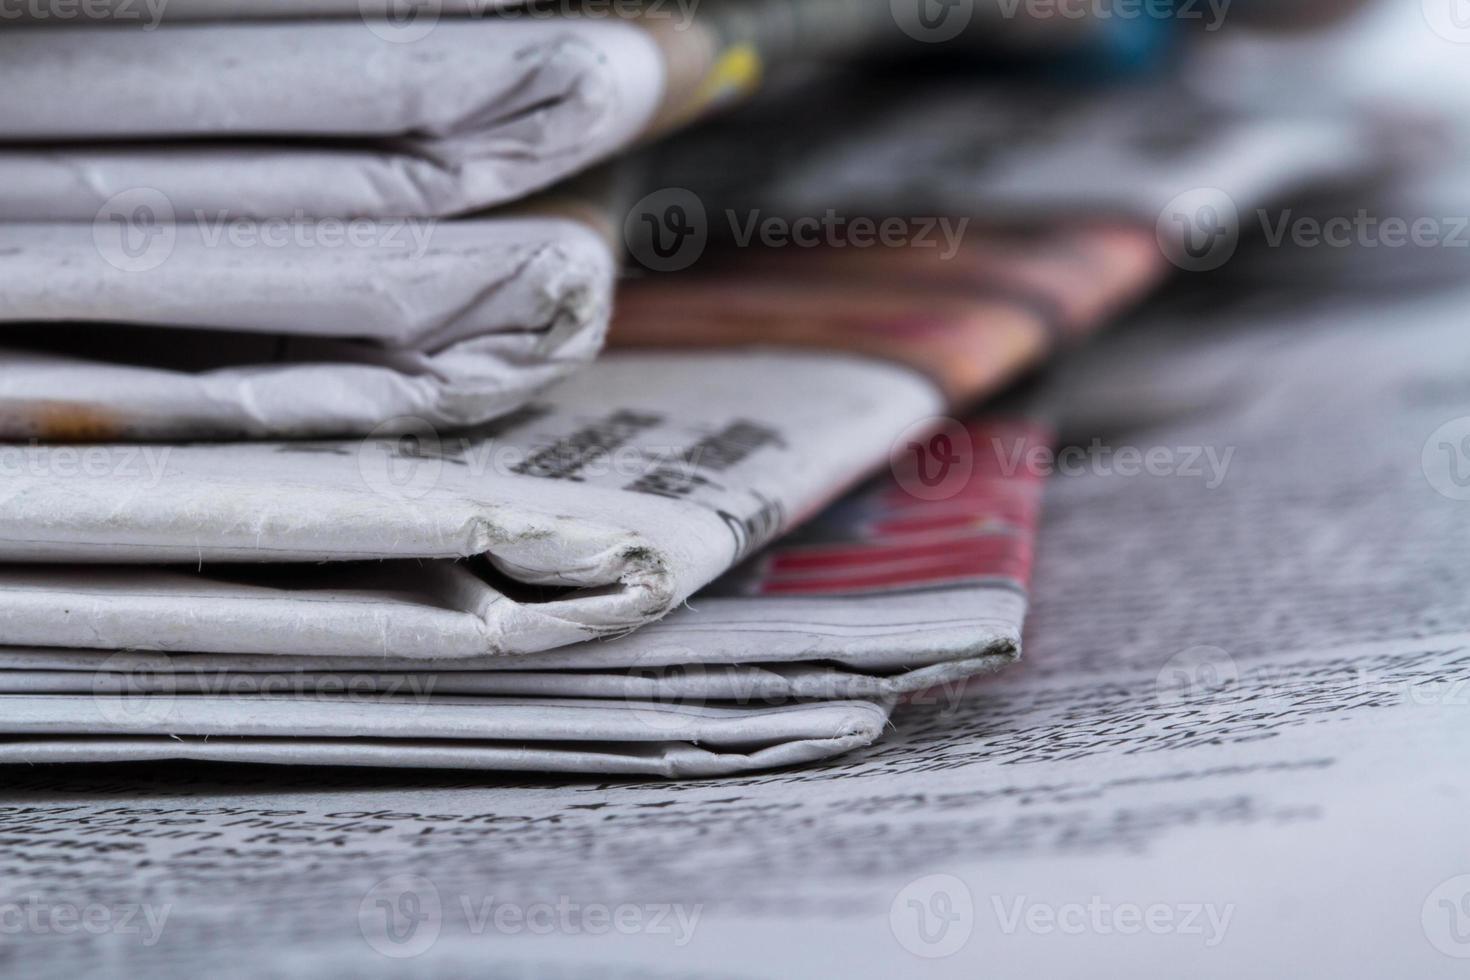 fechar jornais foto